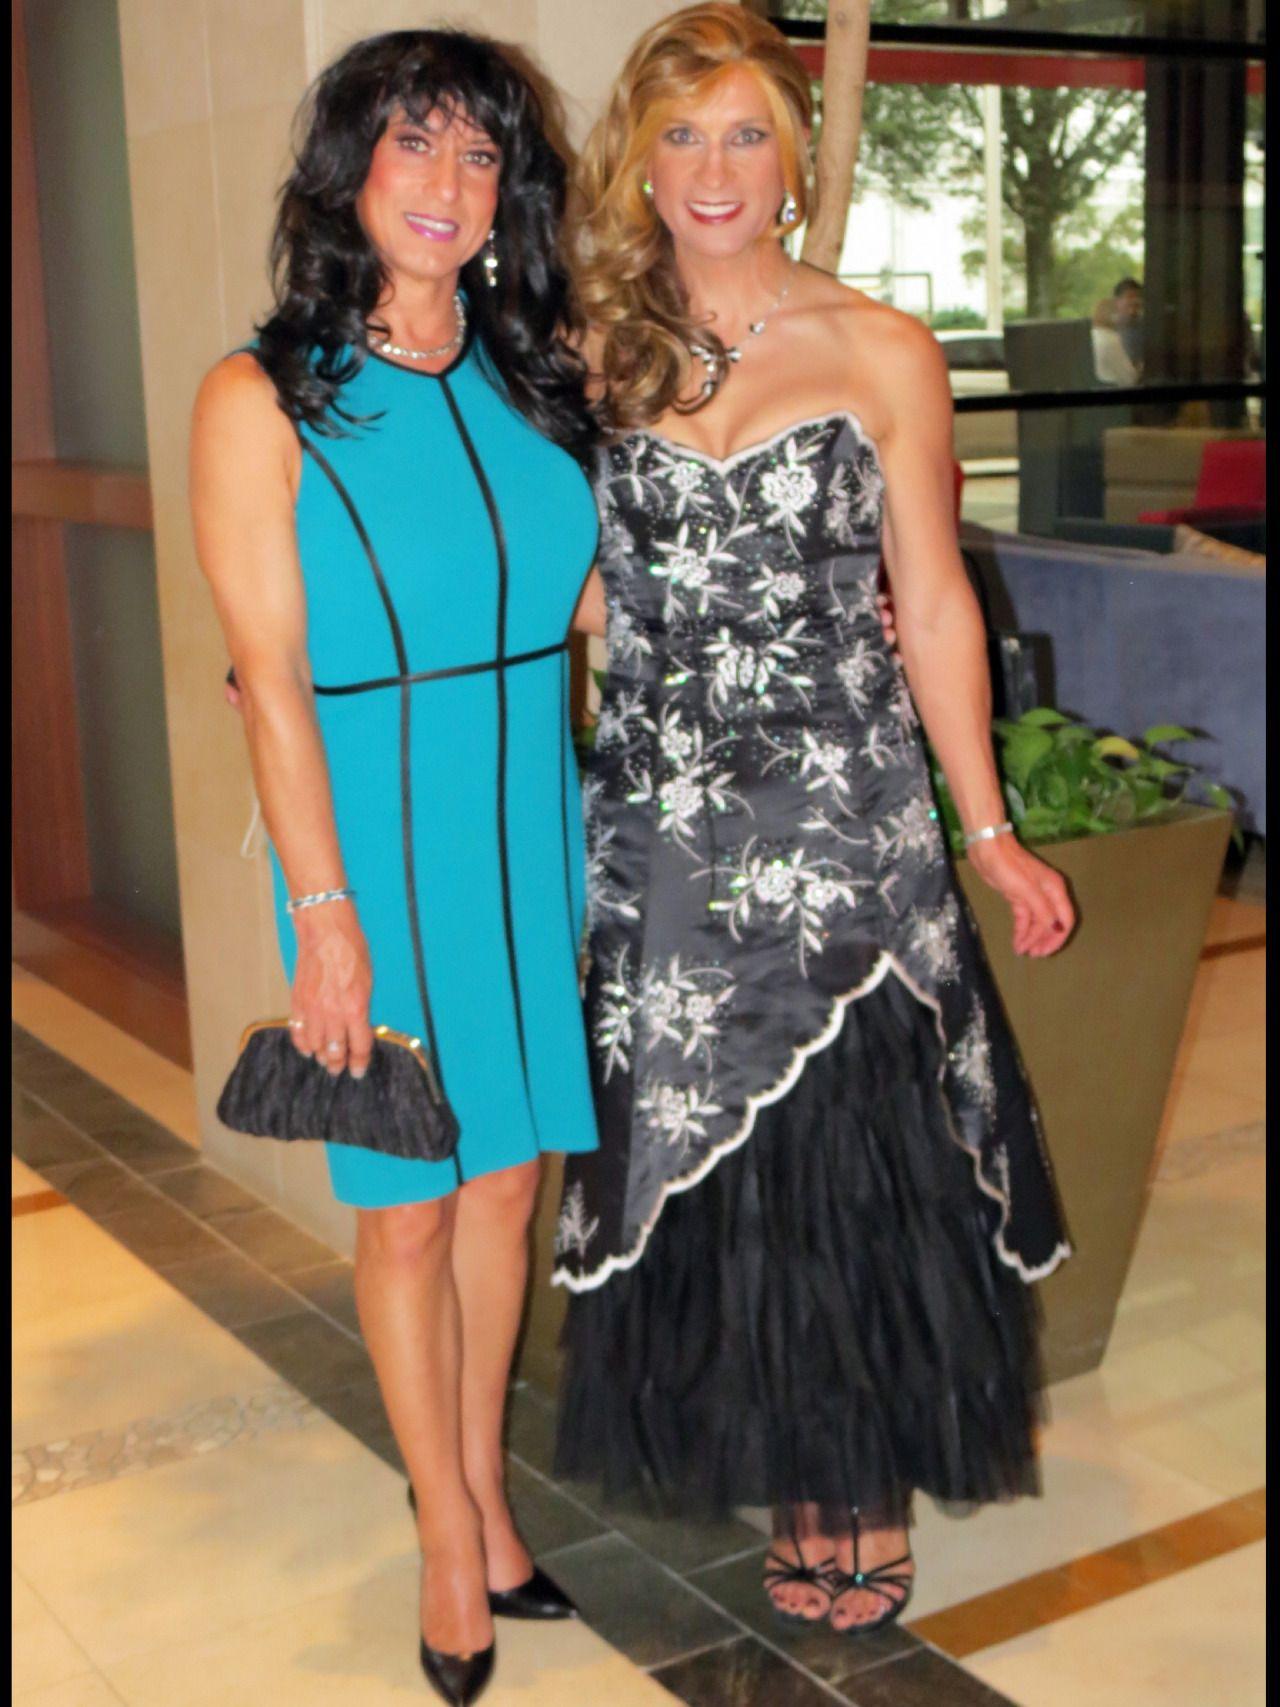 Cristy Garcia and Heidi Phox   Crossdressing   Pinterest   Couples ...